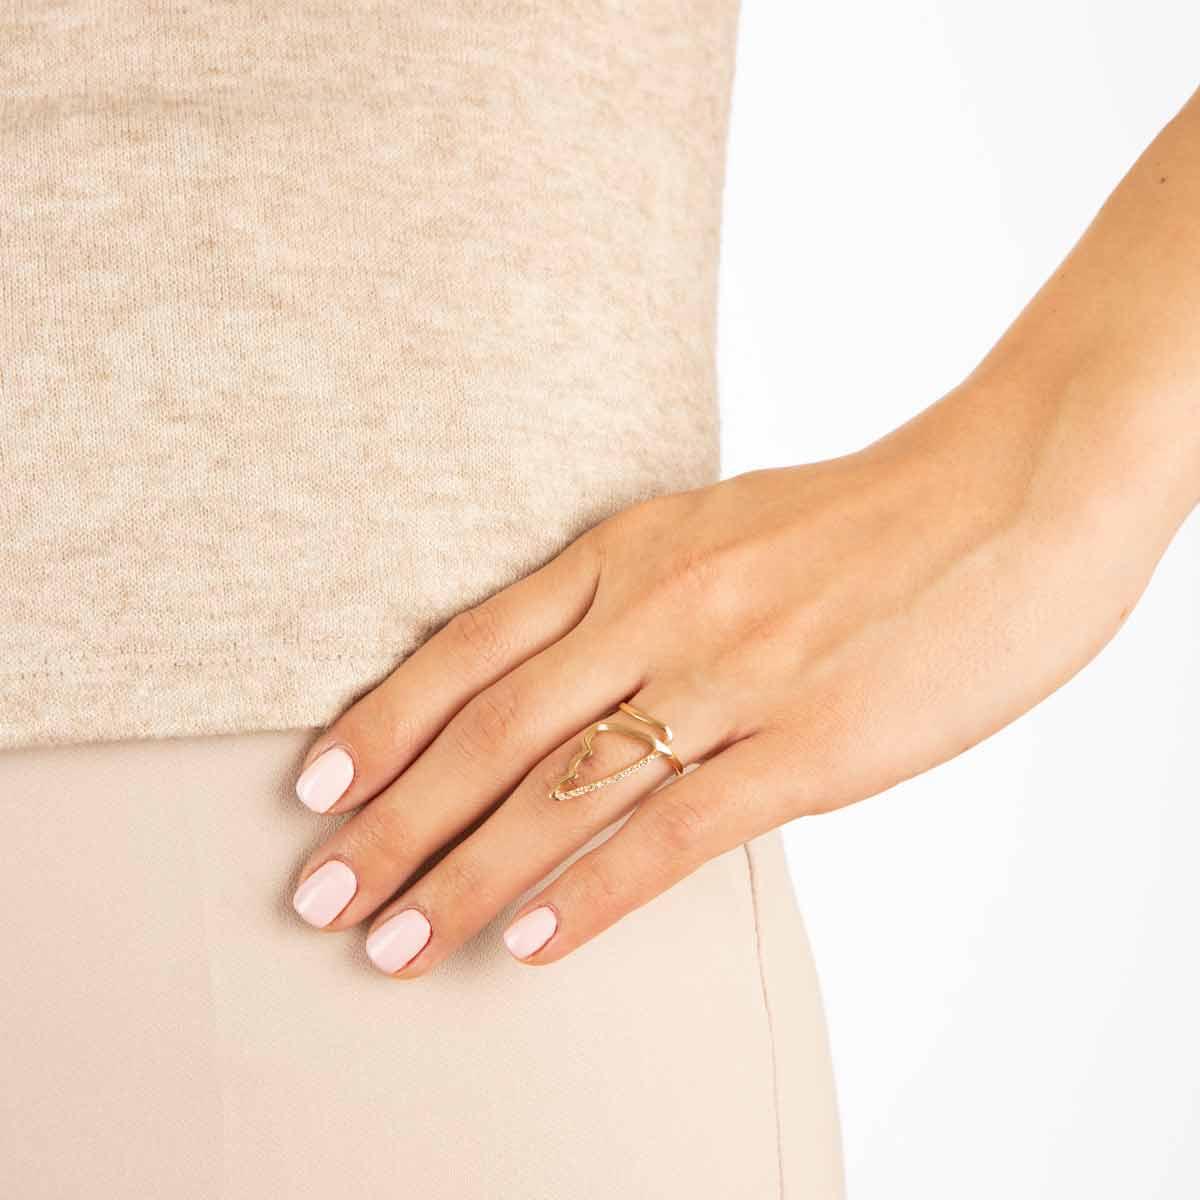 انگشتر طلا بال نگین دار پرسته